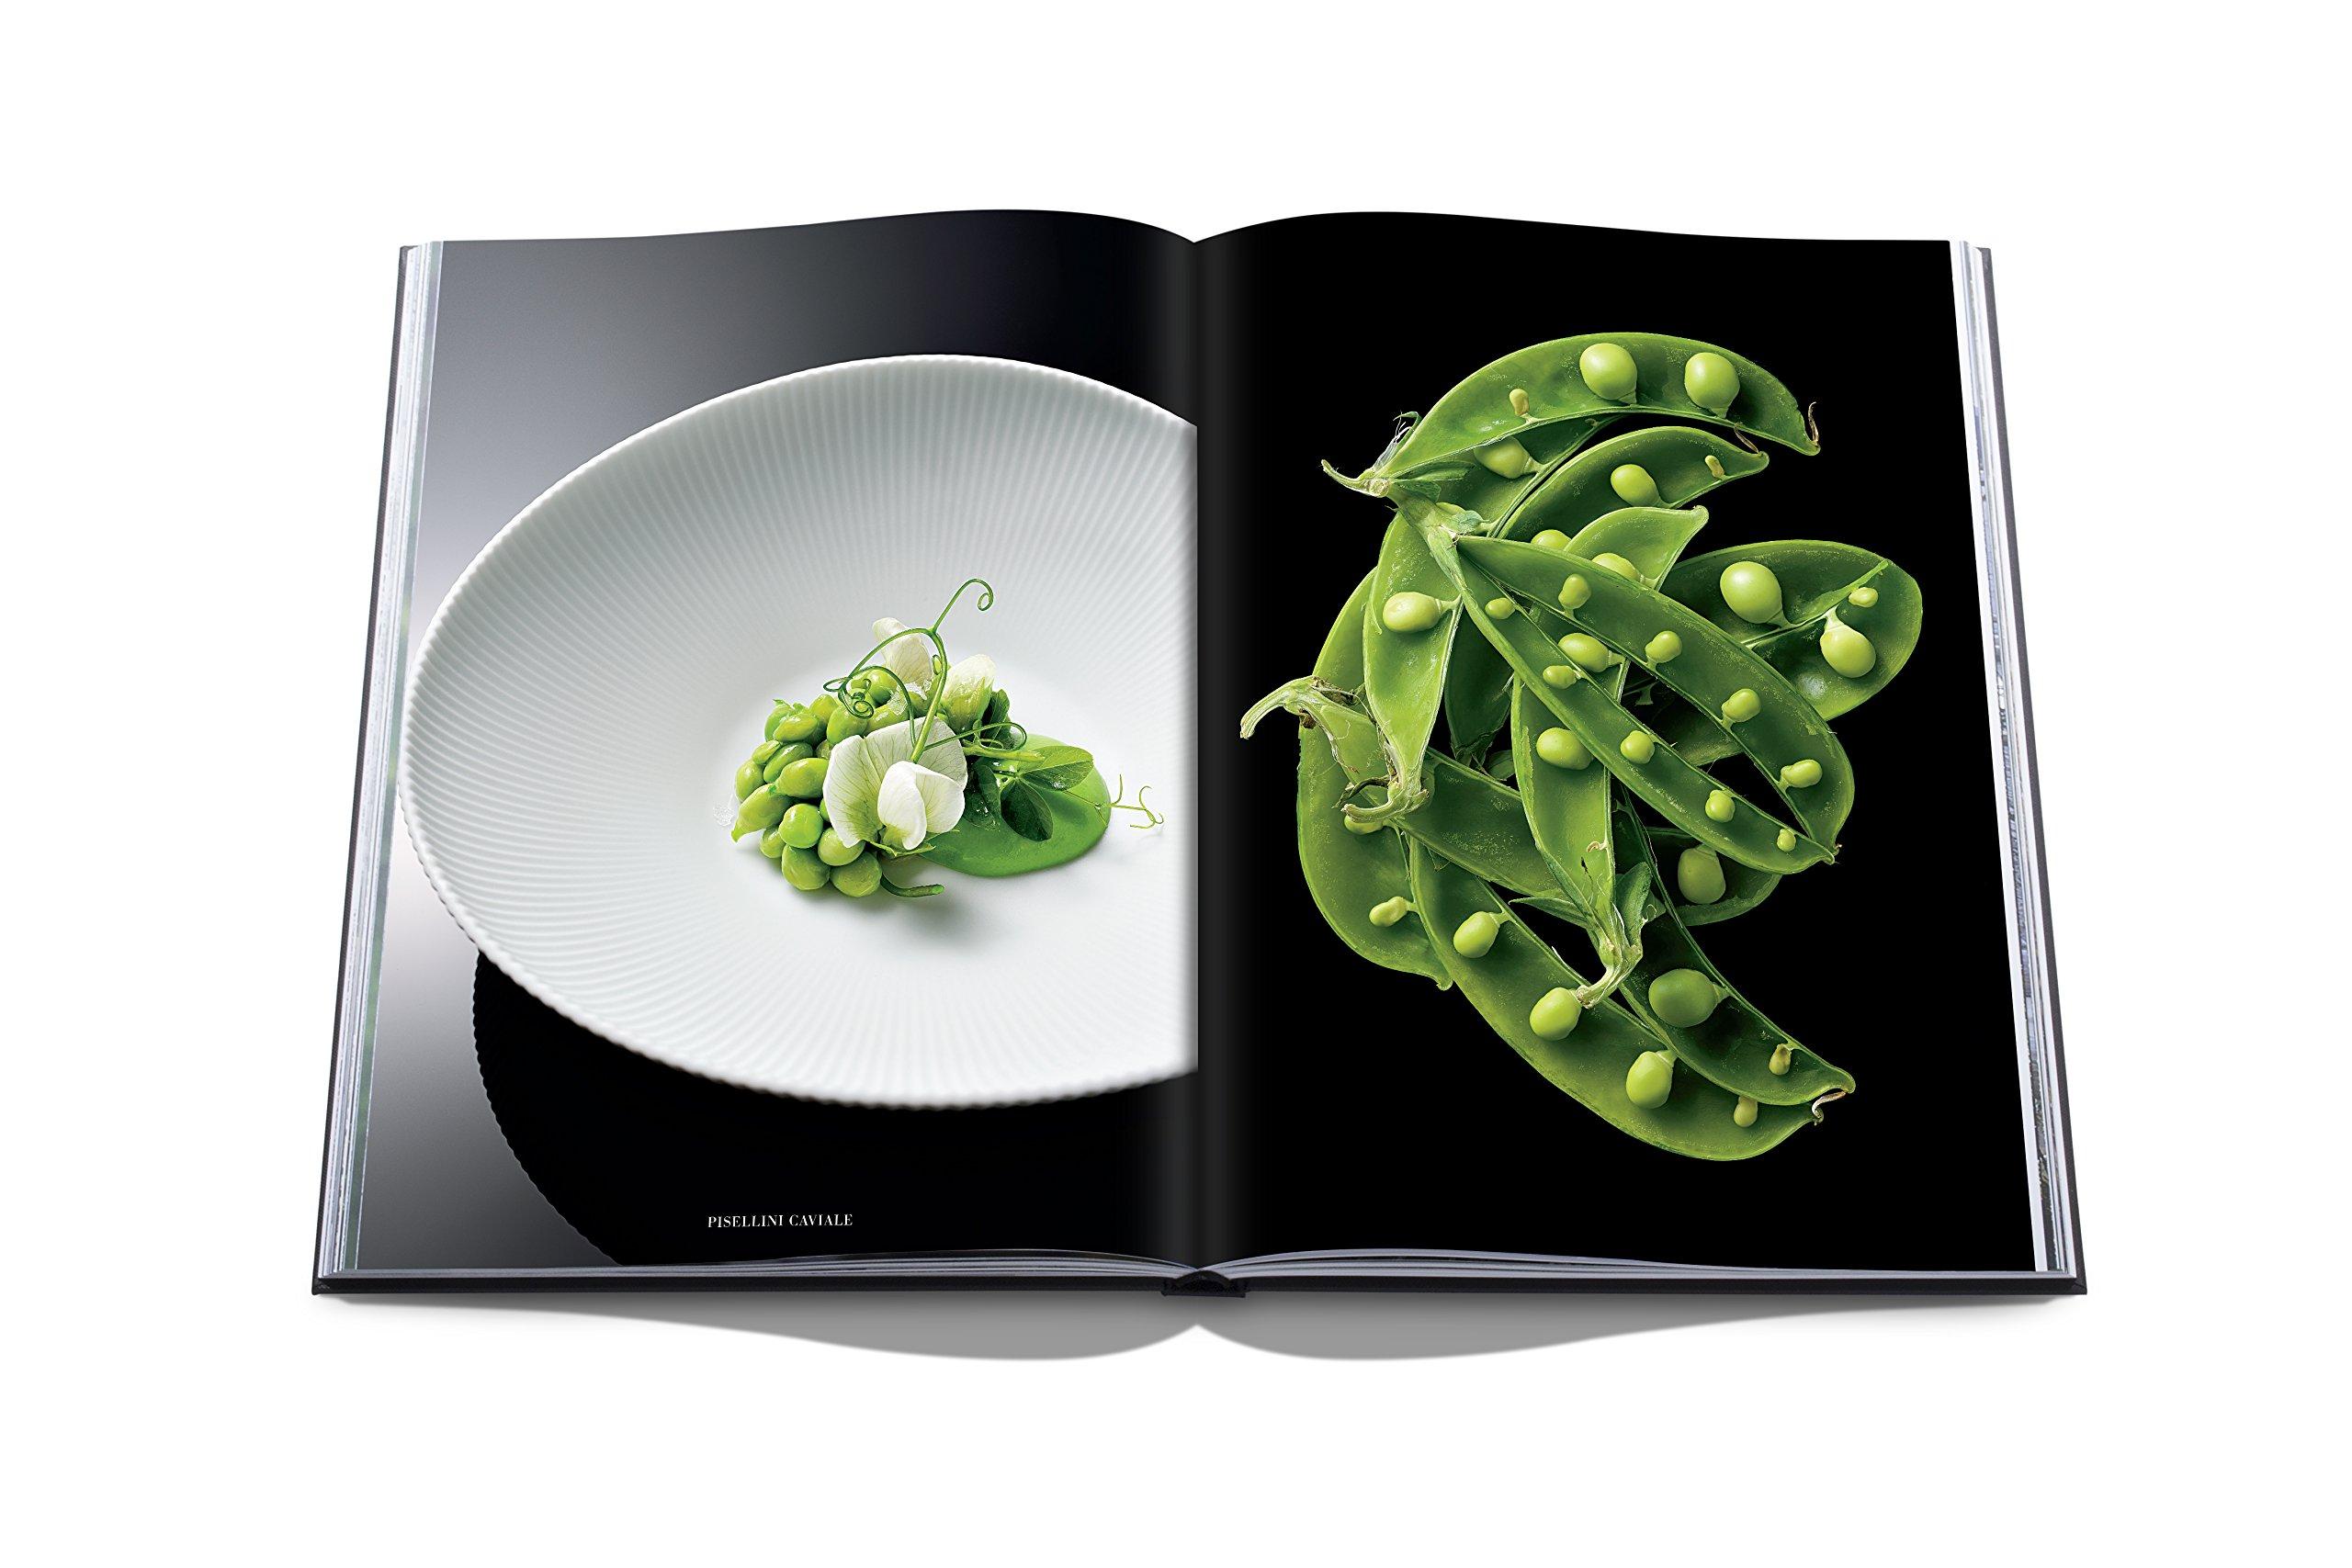 La La Cucina Di Luca Fantin by Bulgari Japanese Legends: Amazon.es: Ursini, Silvio: Libros en idiomas extranjeros